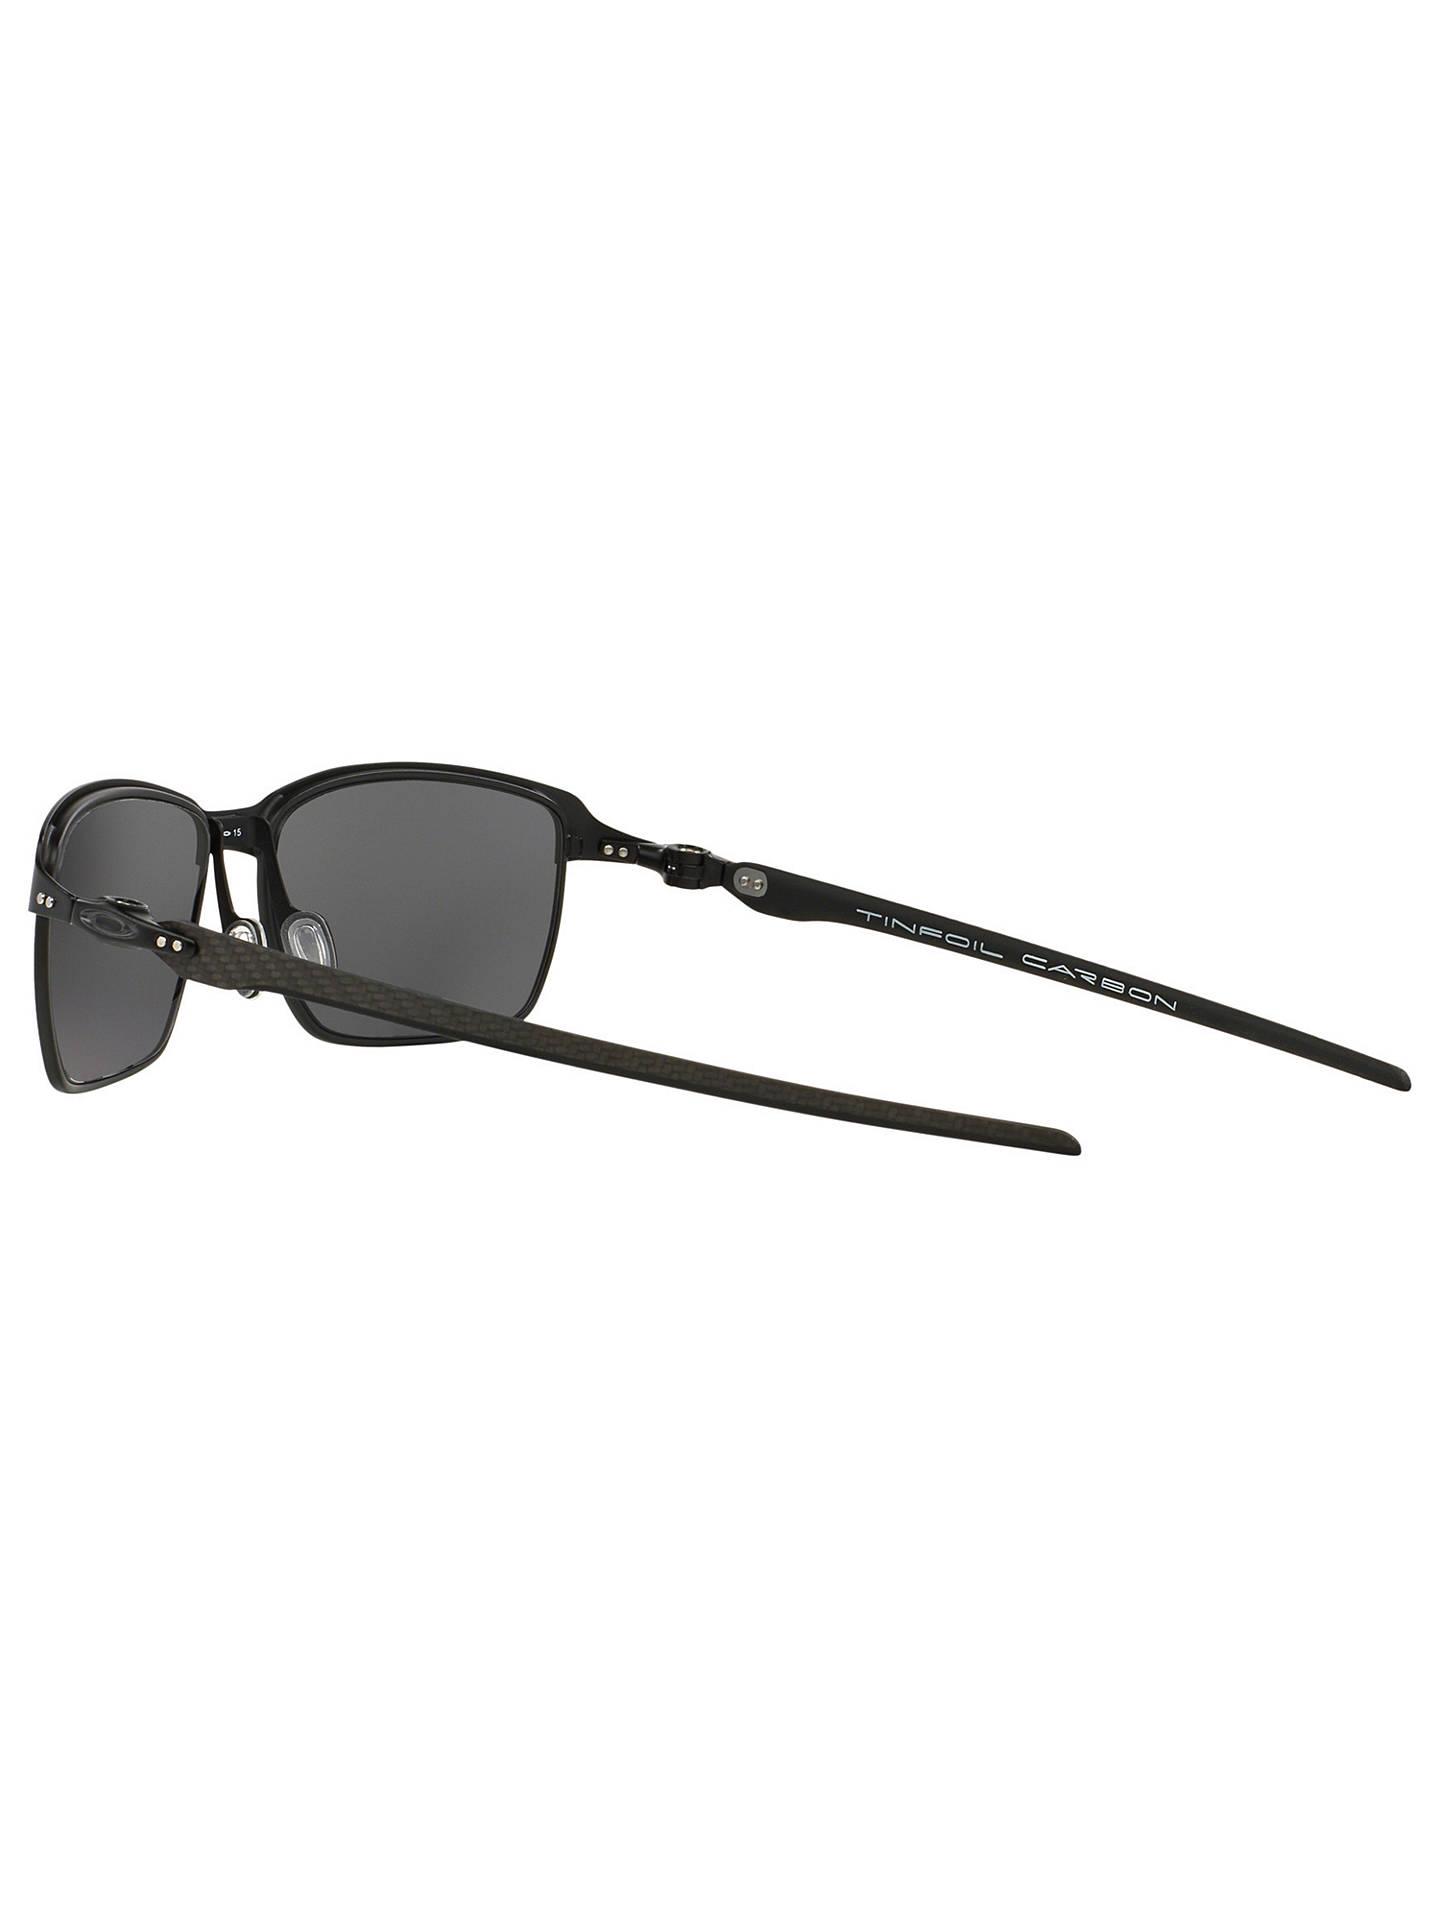 ba71b09a02369 ... Buy Oakley OO6018 Tinfoil Carbon Polarised Rectangular Sunglasses